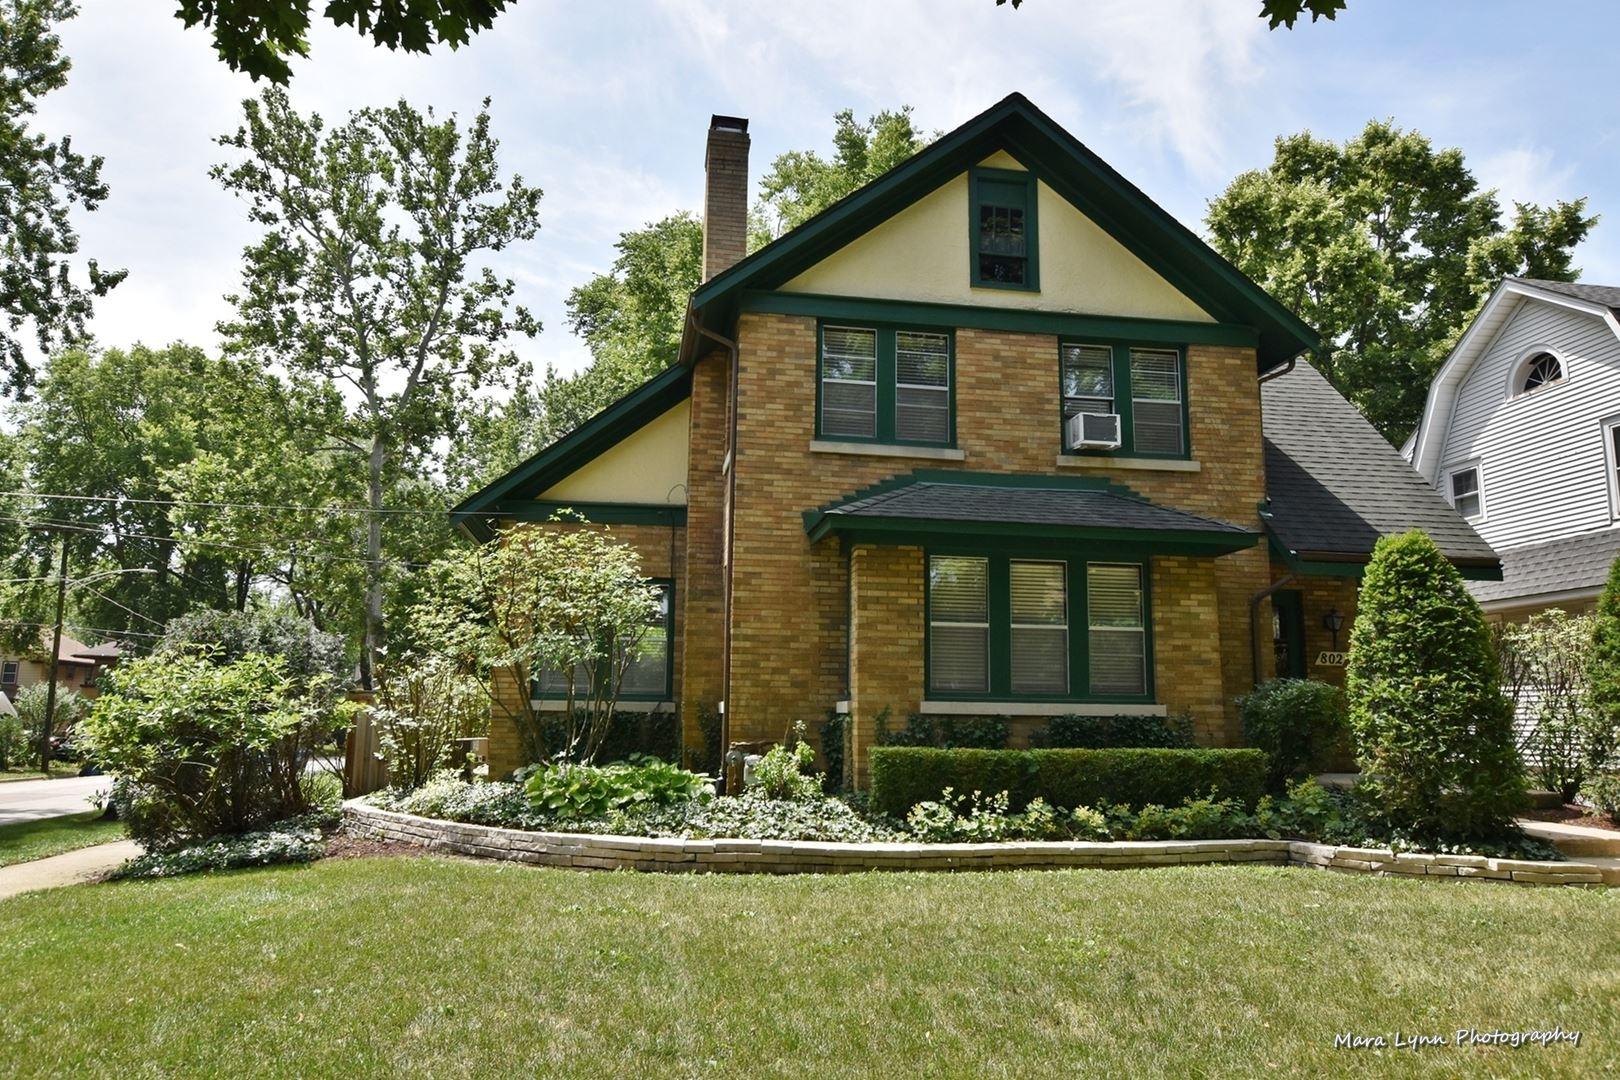 802 W Downer Place, Aurora, IL 60506 - #: 10764823